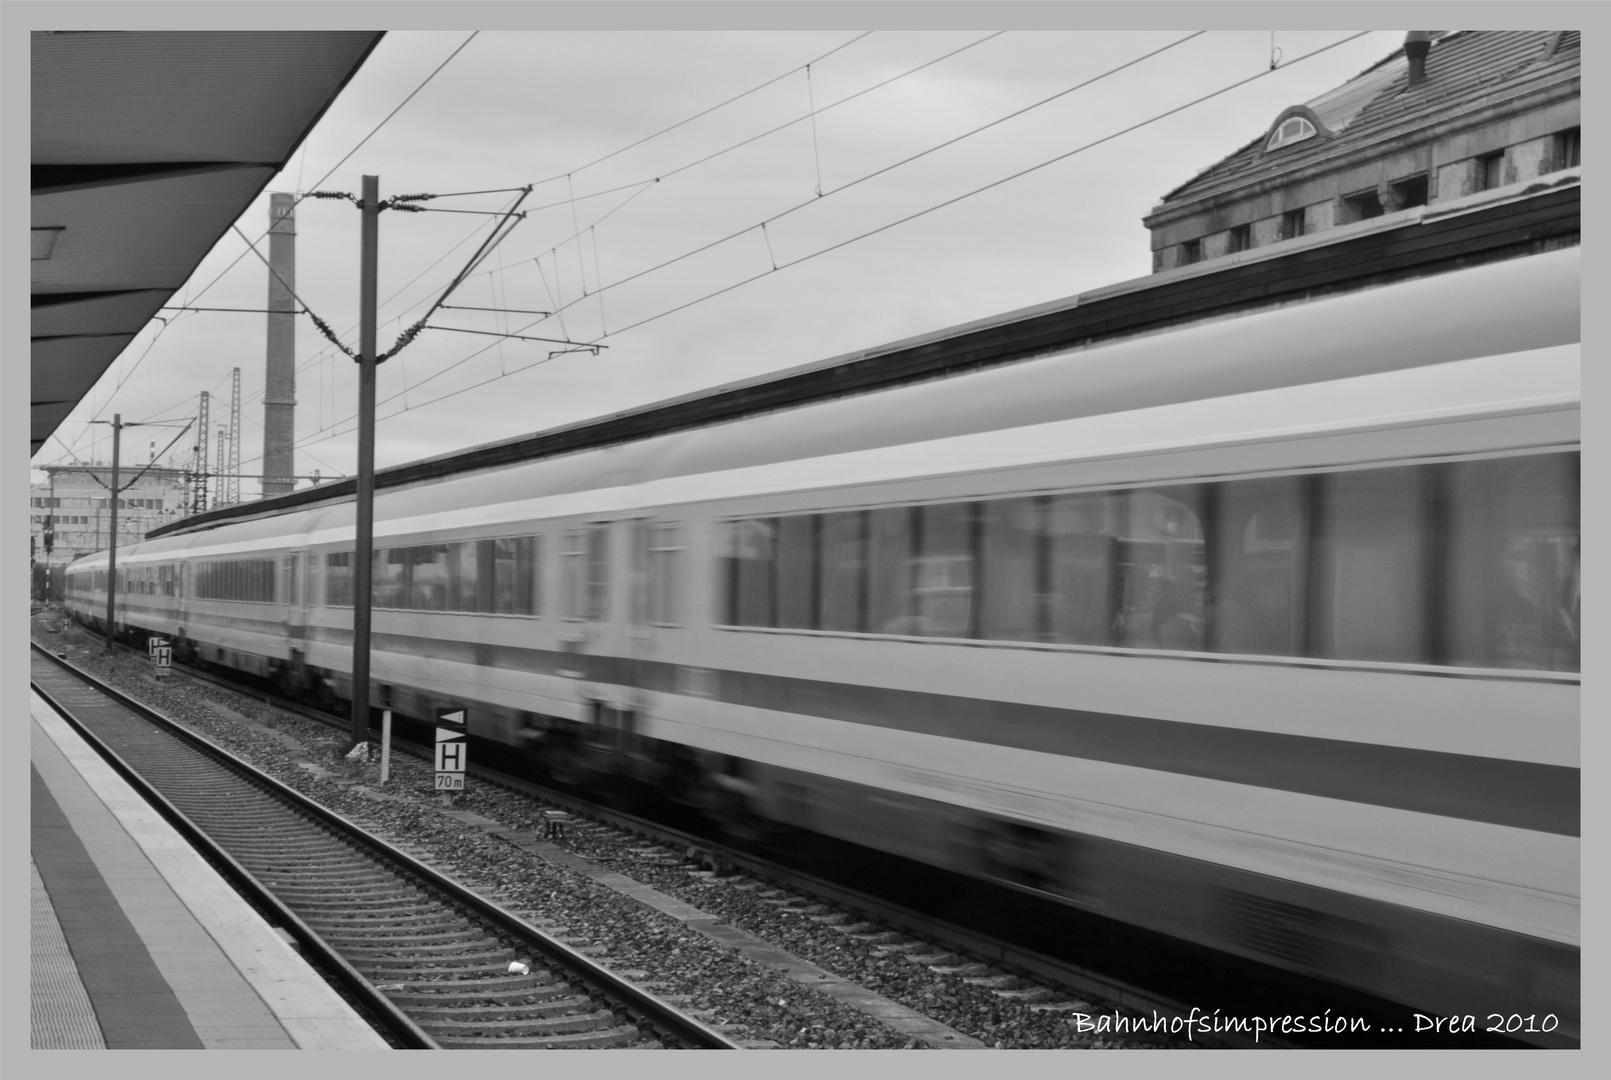 Bahnhofs- impression